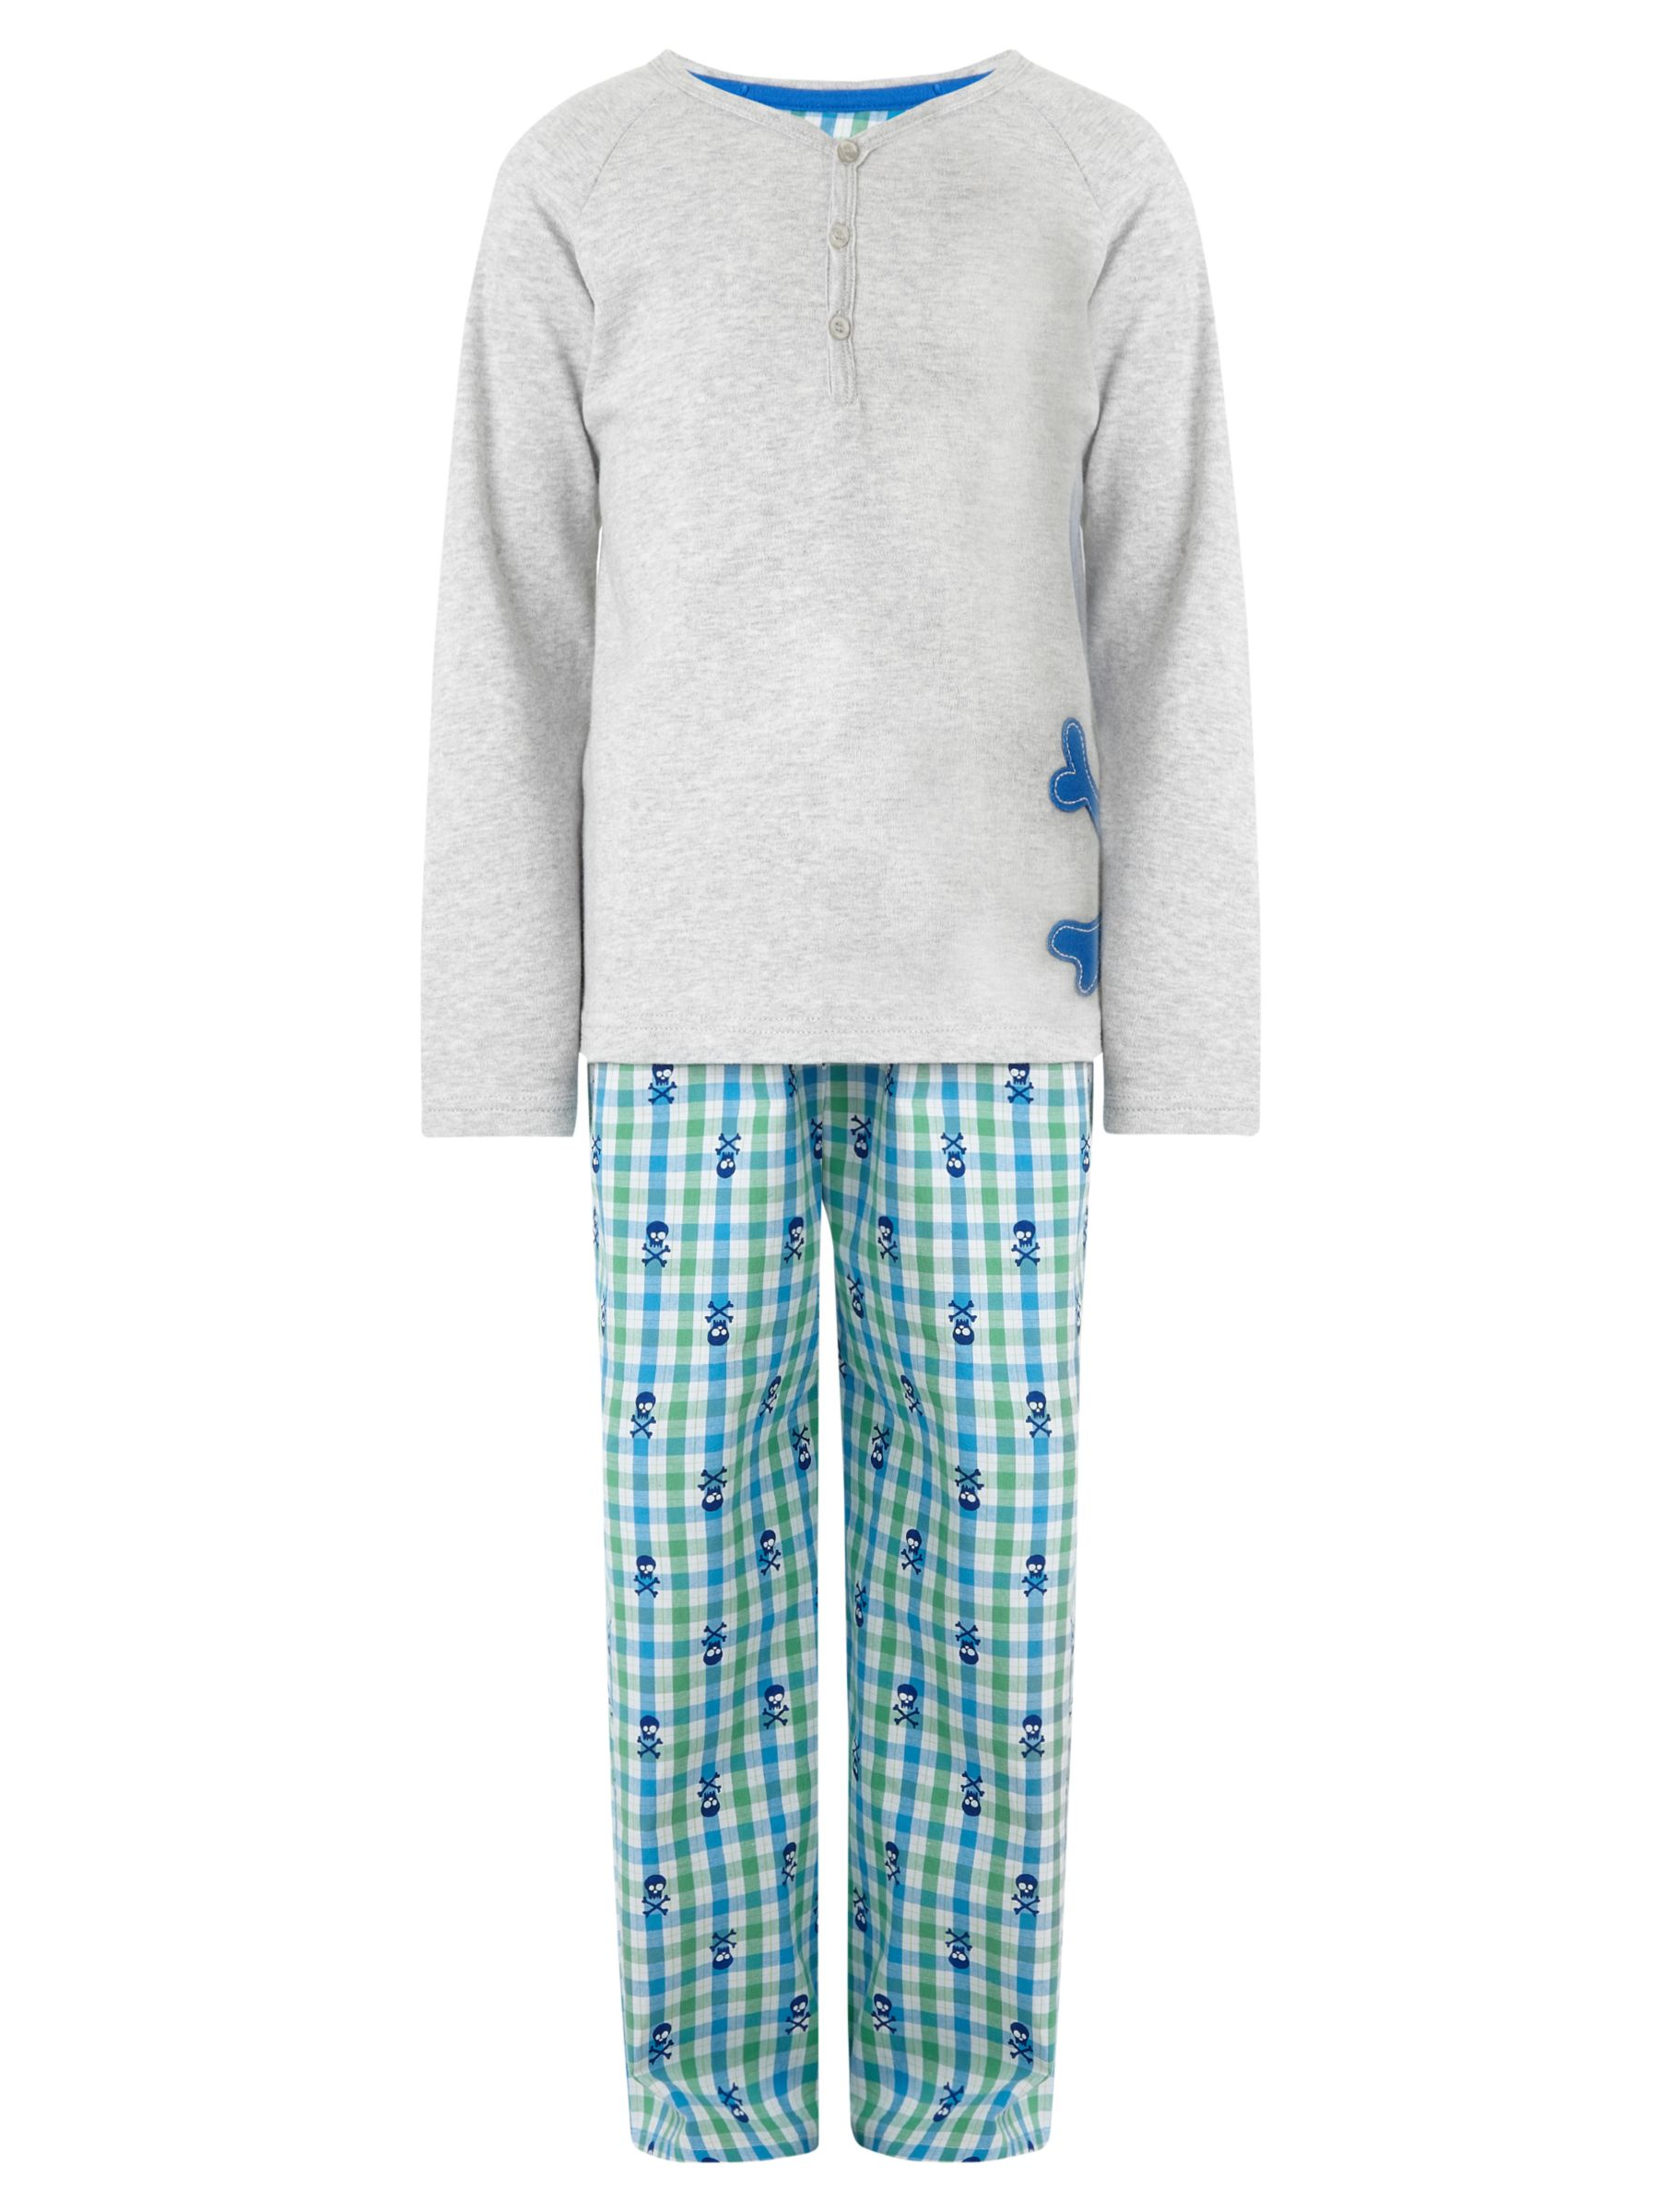 John Lewis Boy Skull and Crossbones Pyjamas, Grey